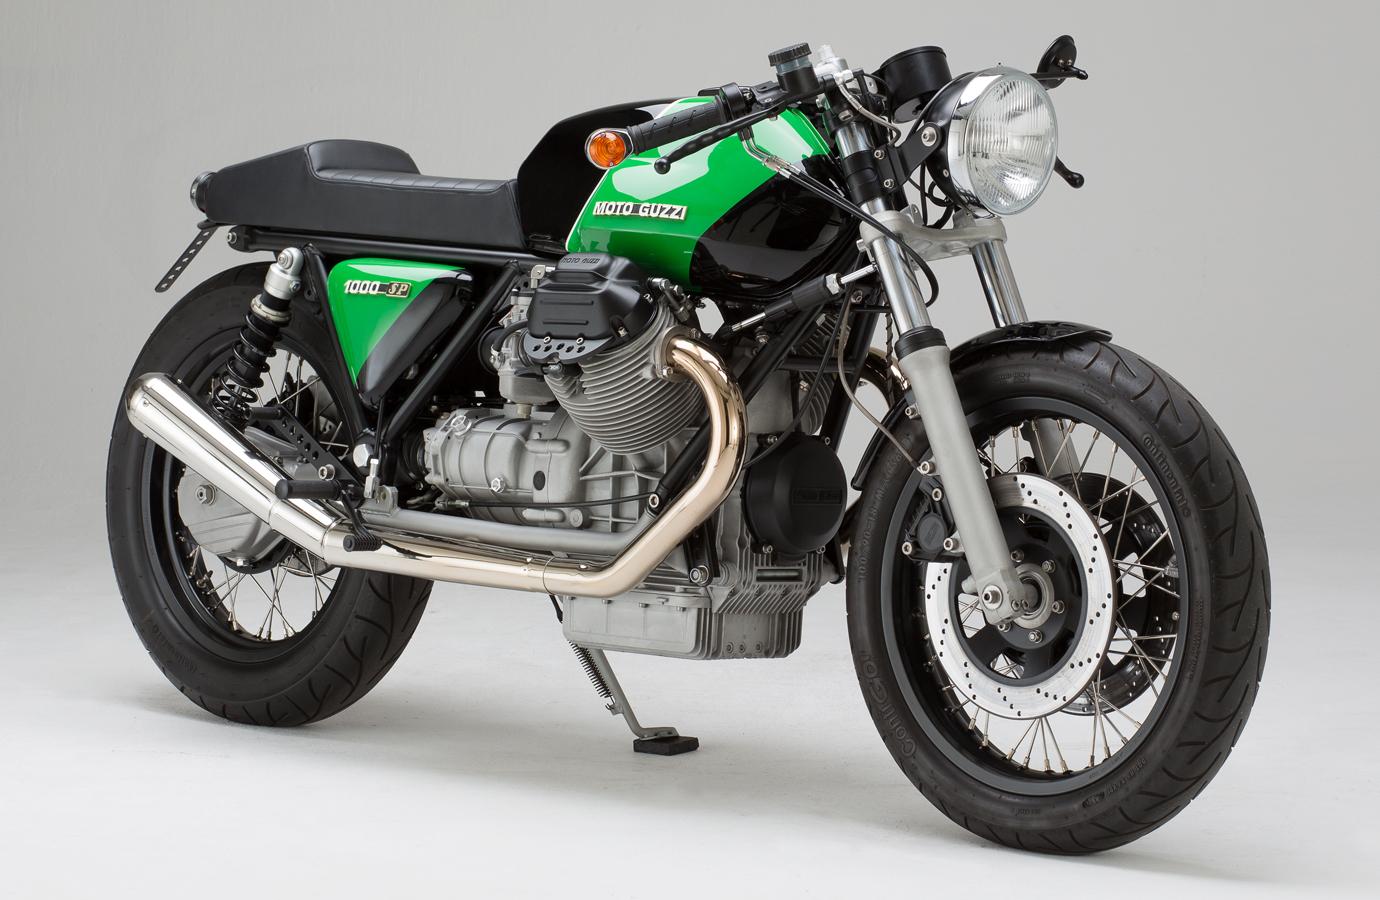 Moto Guzzi G Cafe Racer